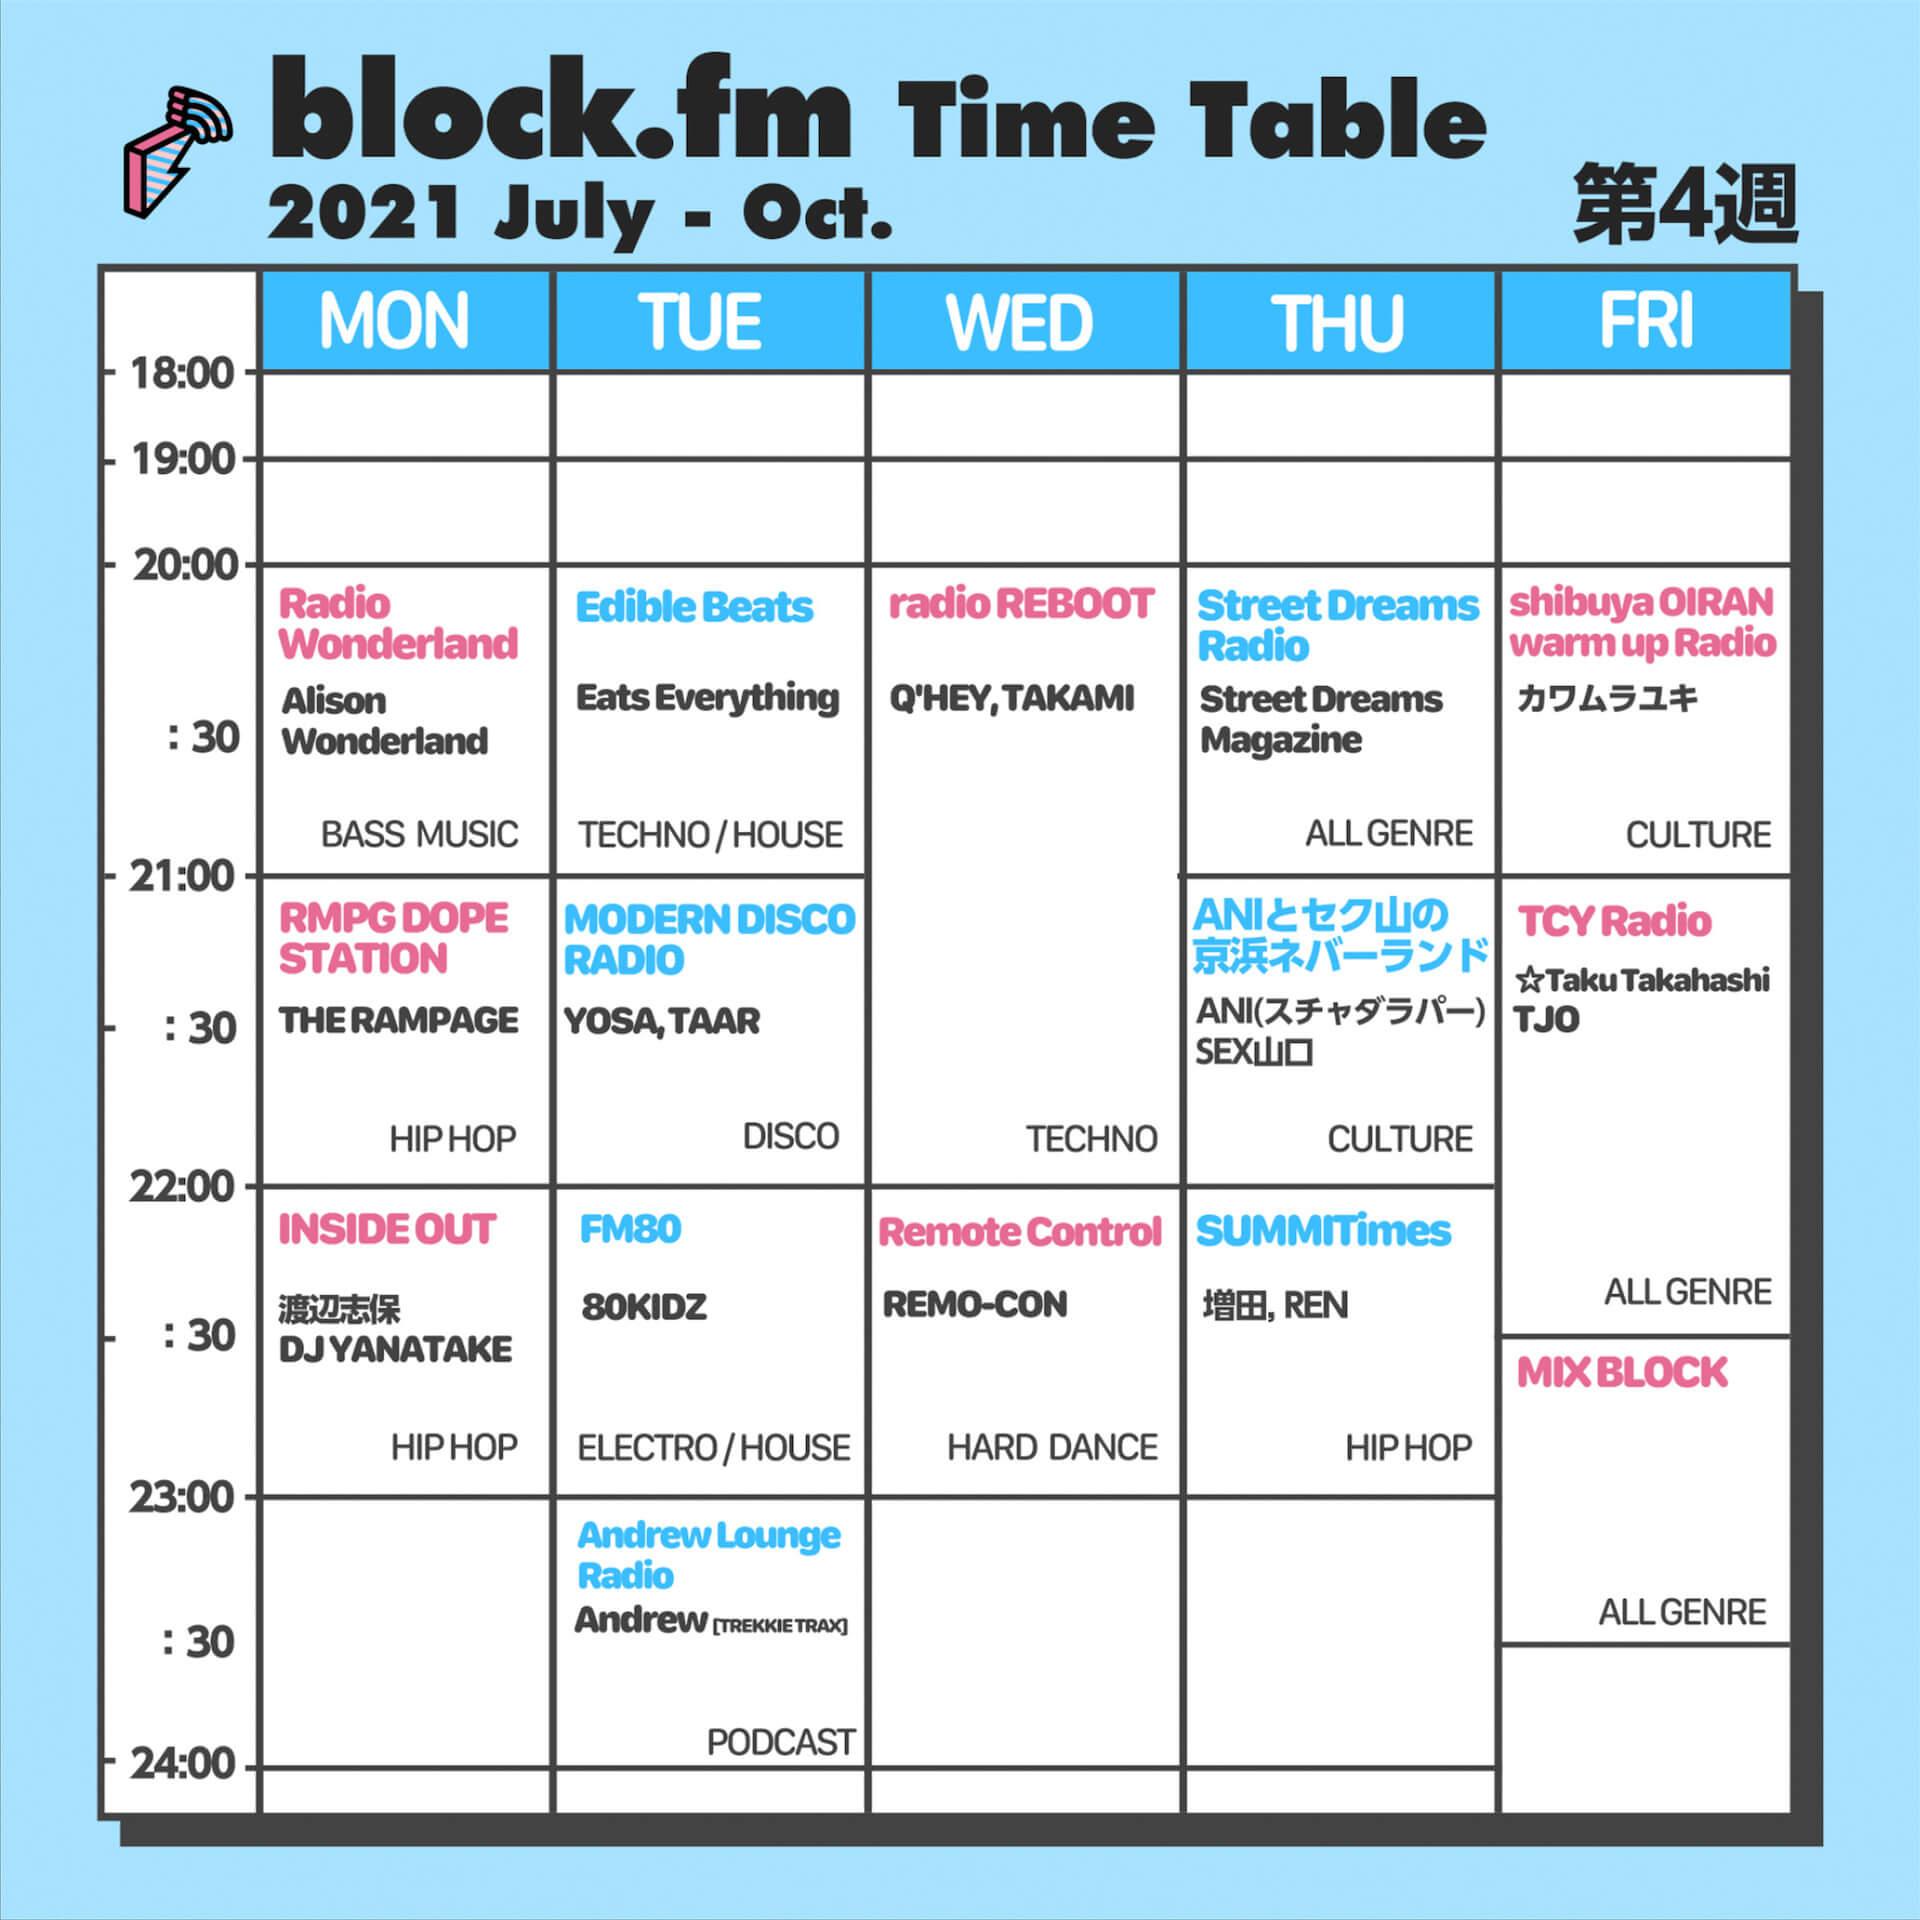 block.fmにて三原勇希のレギュラー番組『Time for Bed』が゙放送スタート!7月以降のラジオ放送スケジュールも公開 music_210702_Time-for-Bed8